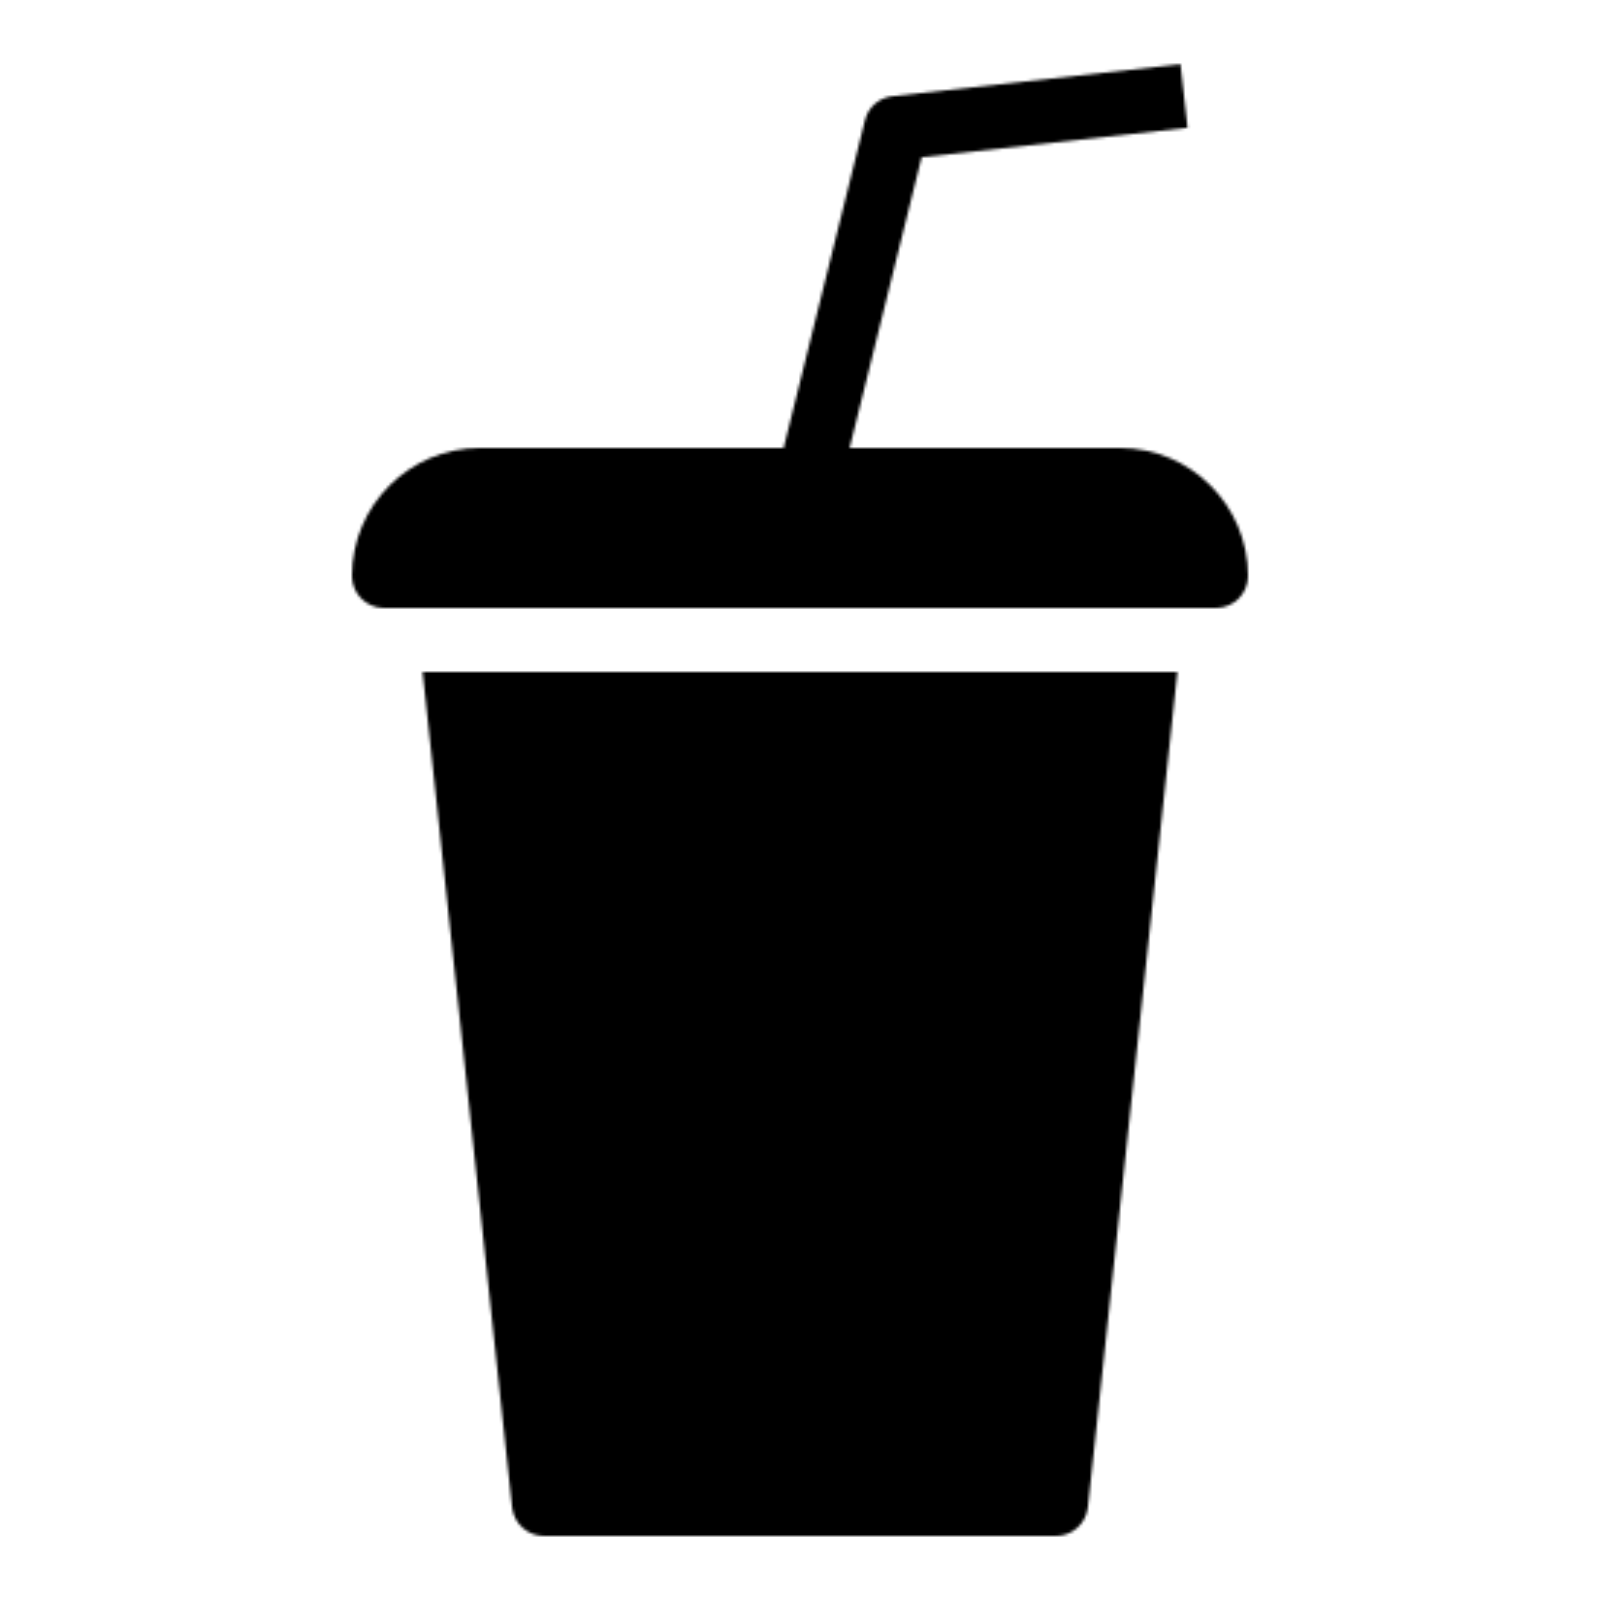 Soda Filled icon